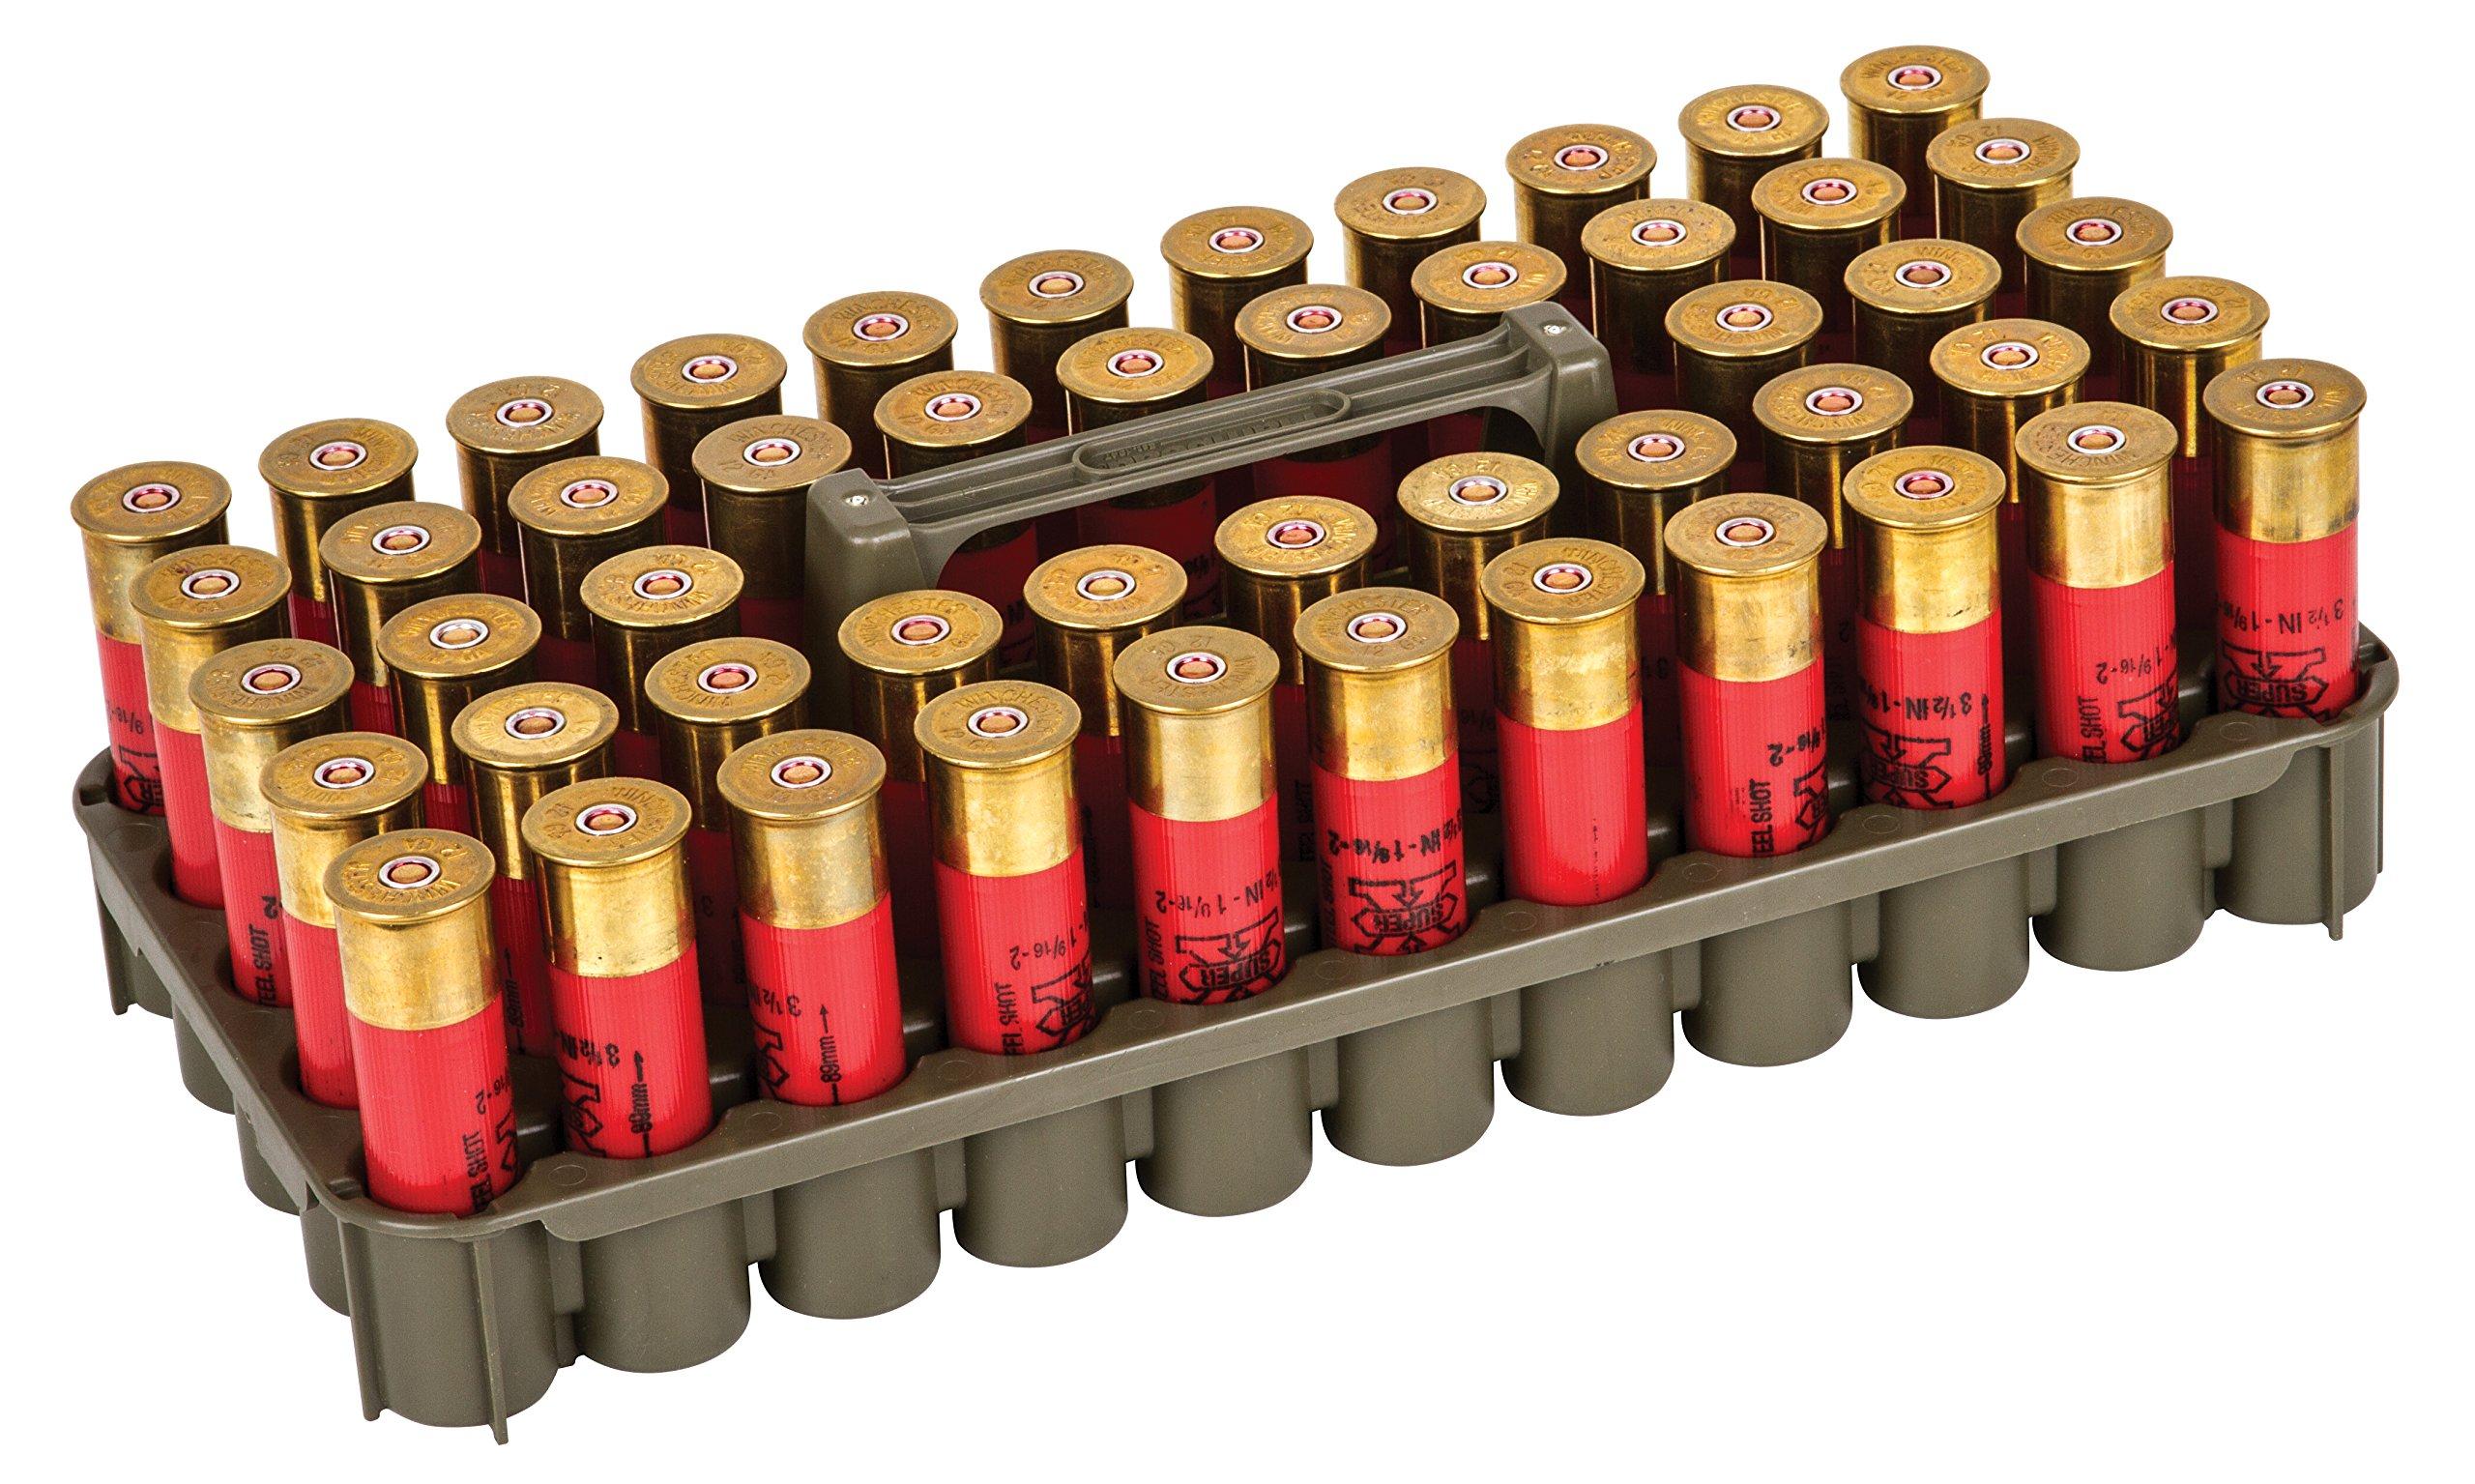 Flambeau Outdoors 1250ST Shotshell Storage Tray, PDQ